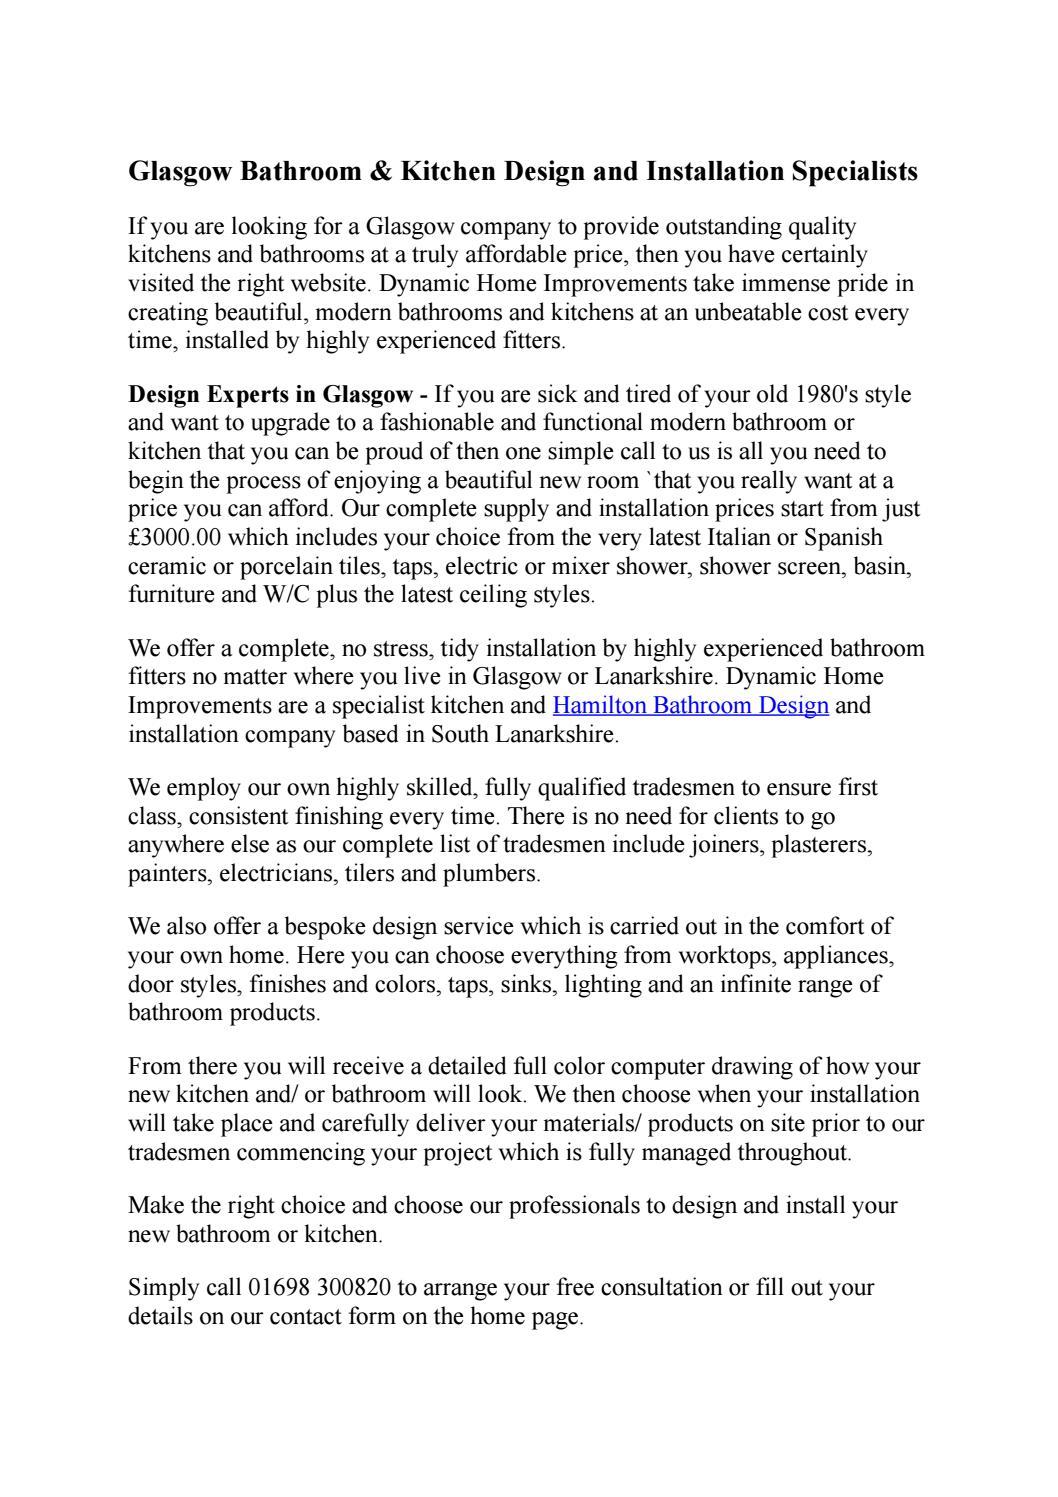 Glasgow bathroom & kitchen design and installation specialists by ...